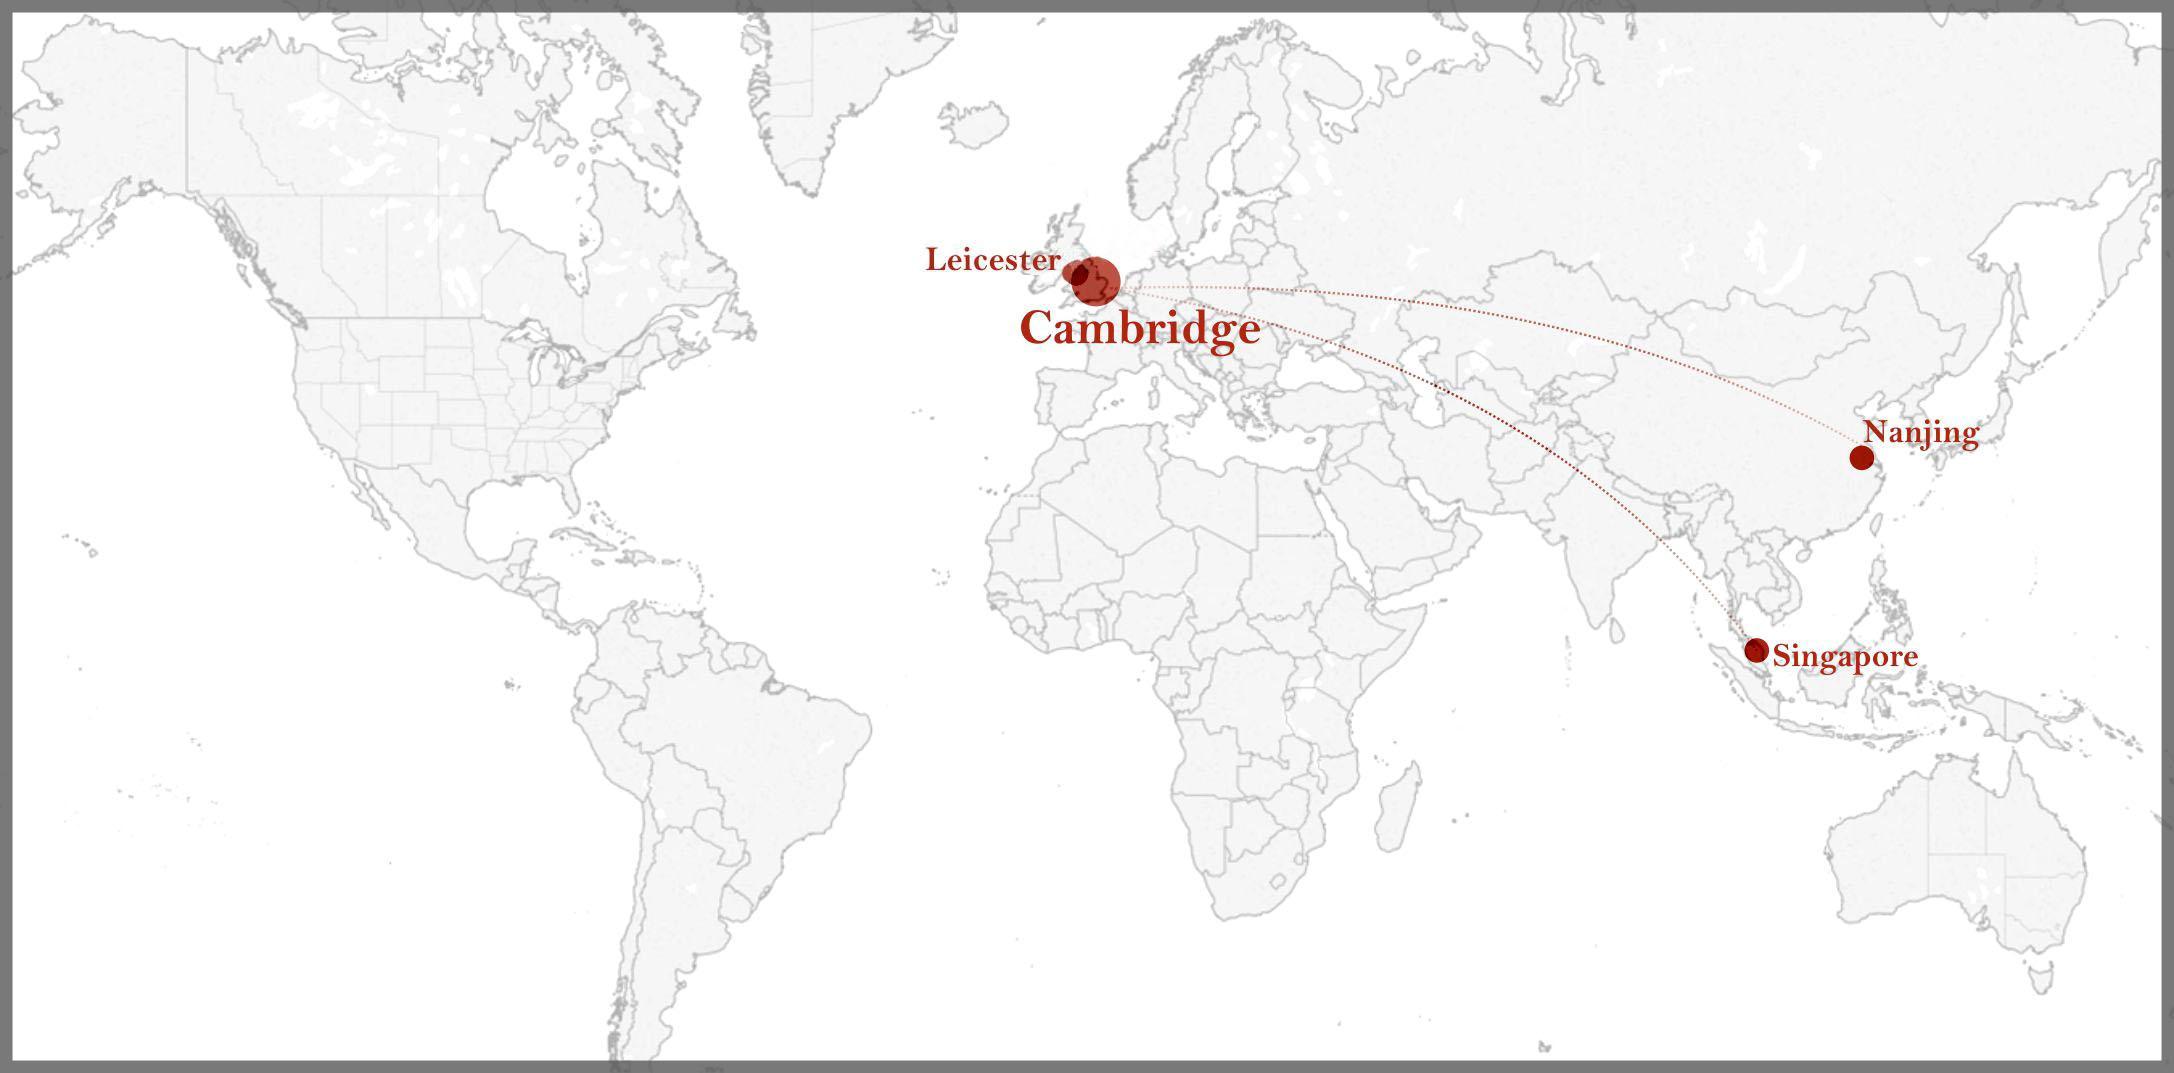 Map-Collaborators-withoutYork